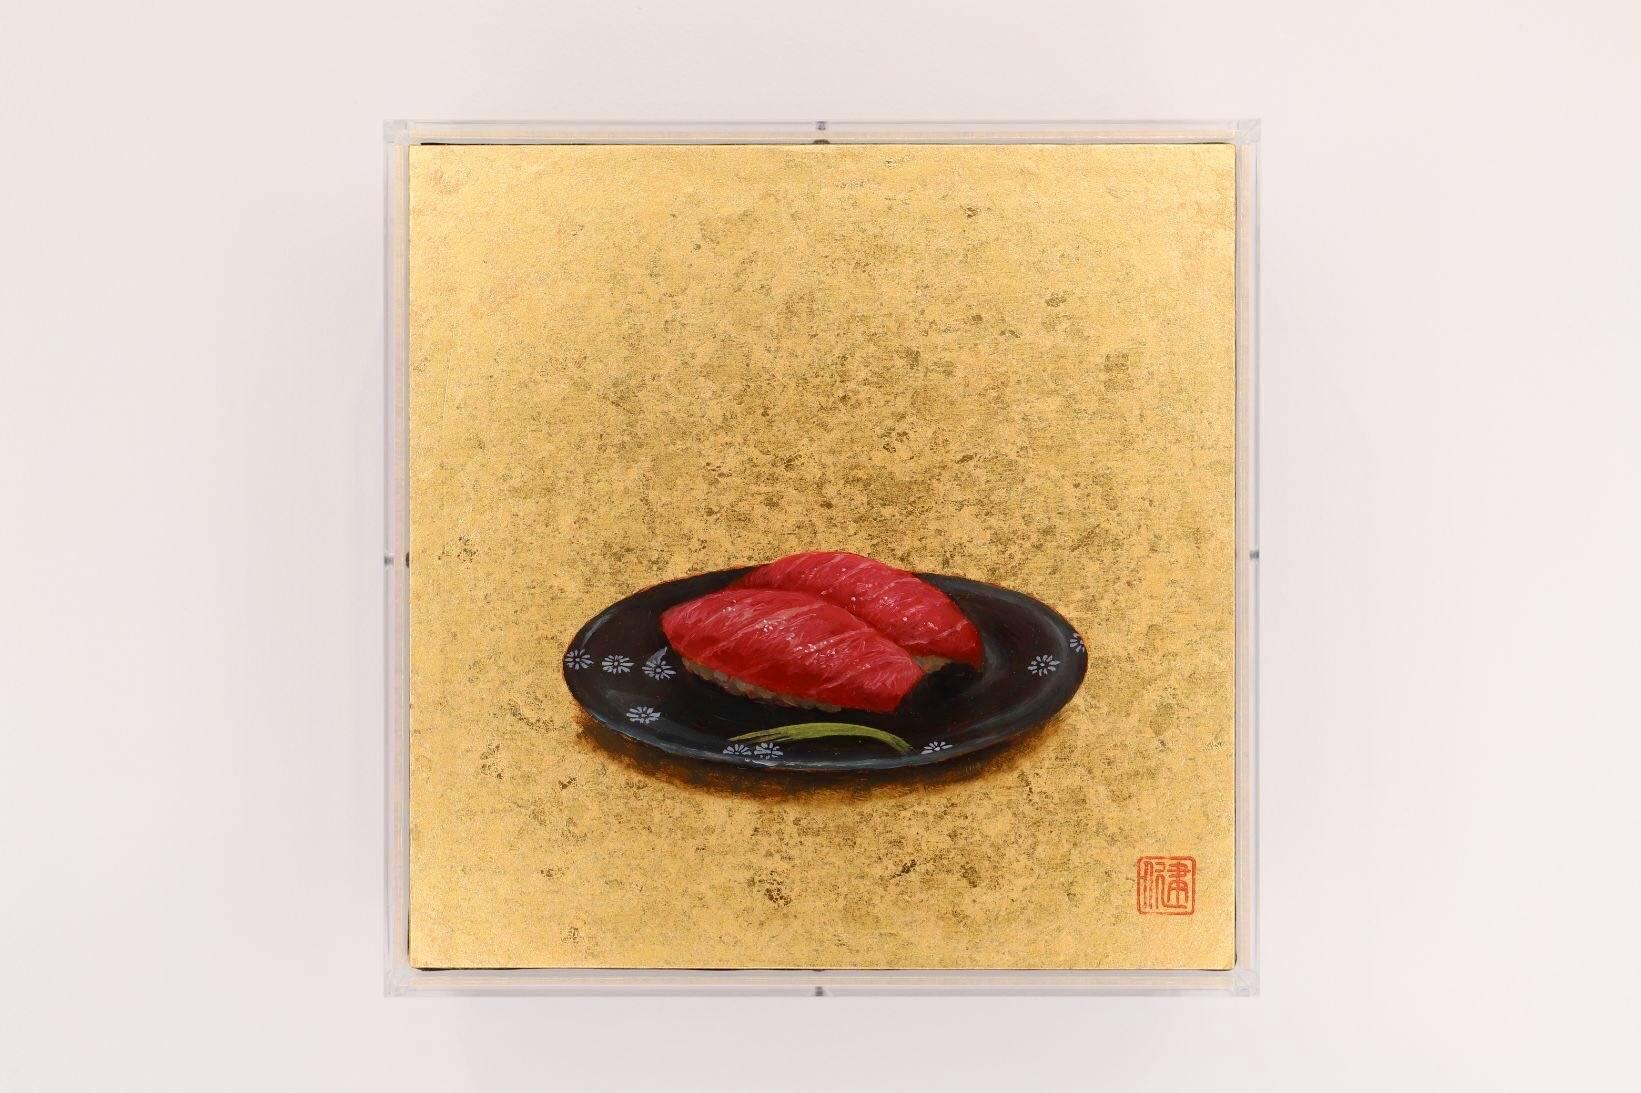 Sushi - Tuna